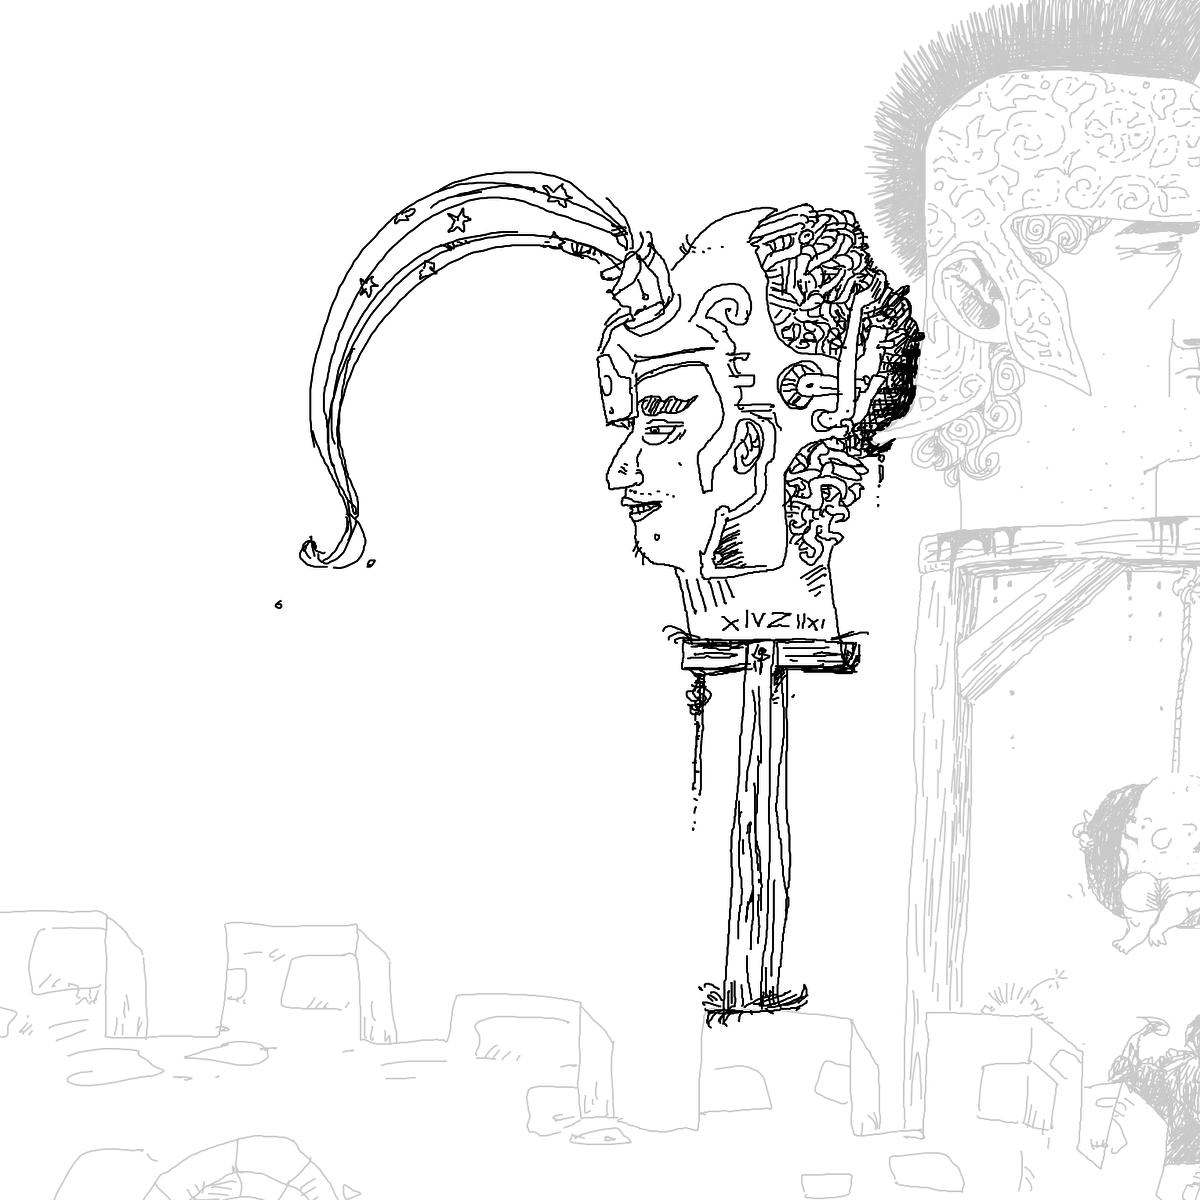 BAAAM drawing#6296 lat:78.4207458496093800lng: -4.4898967742919920